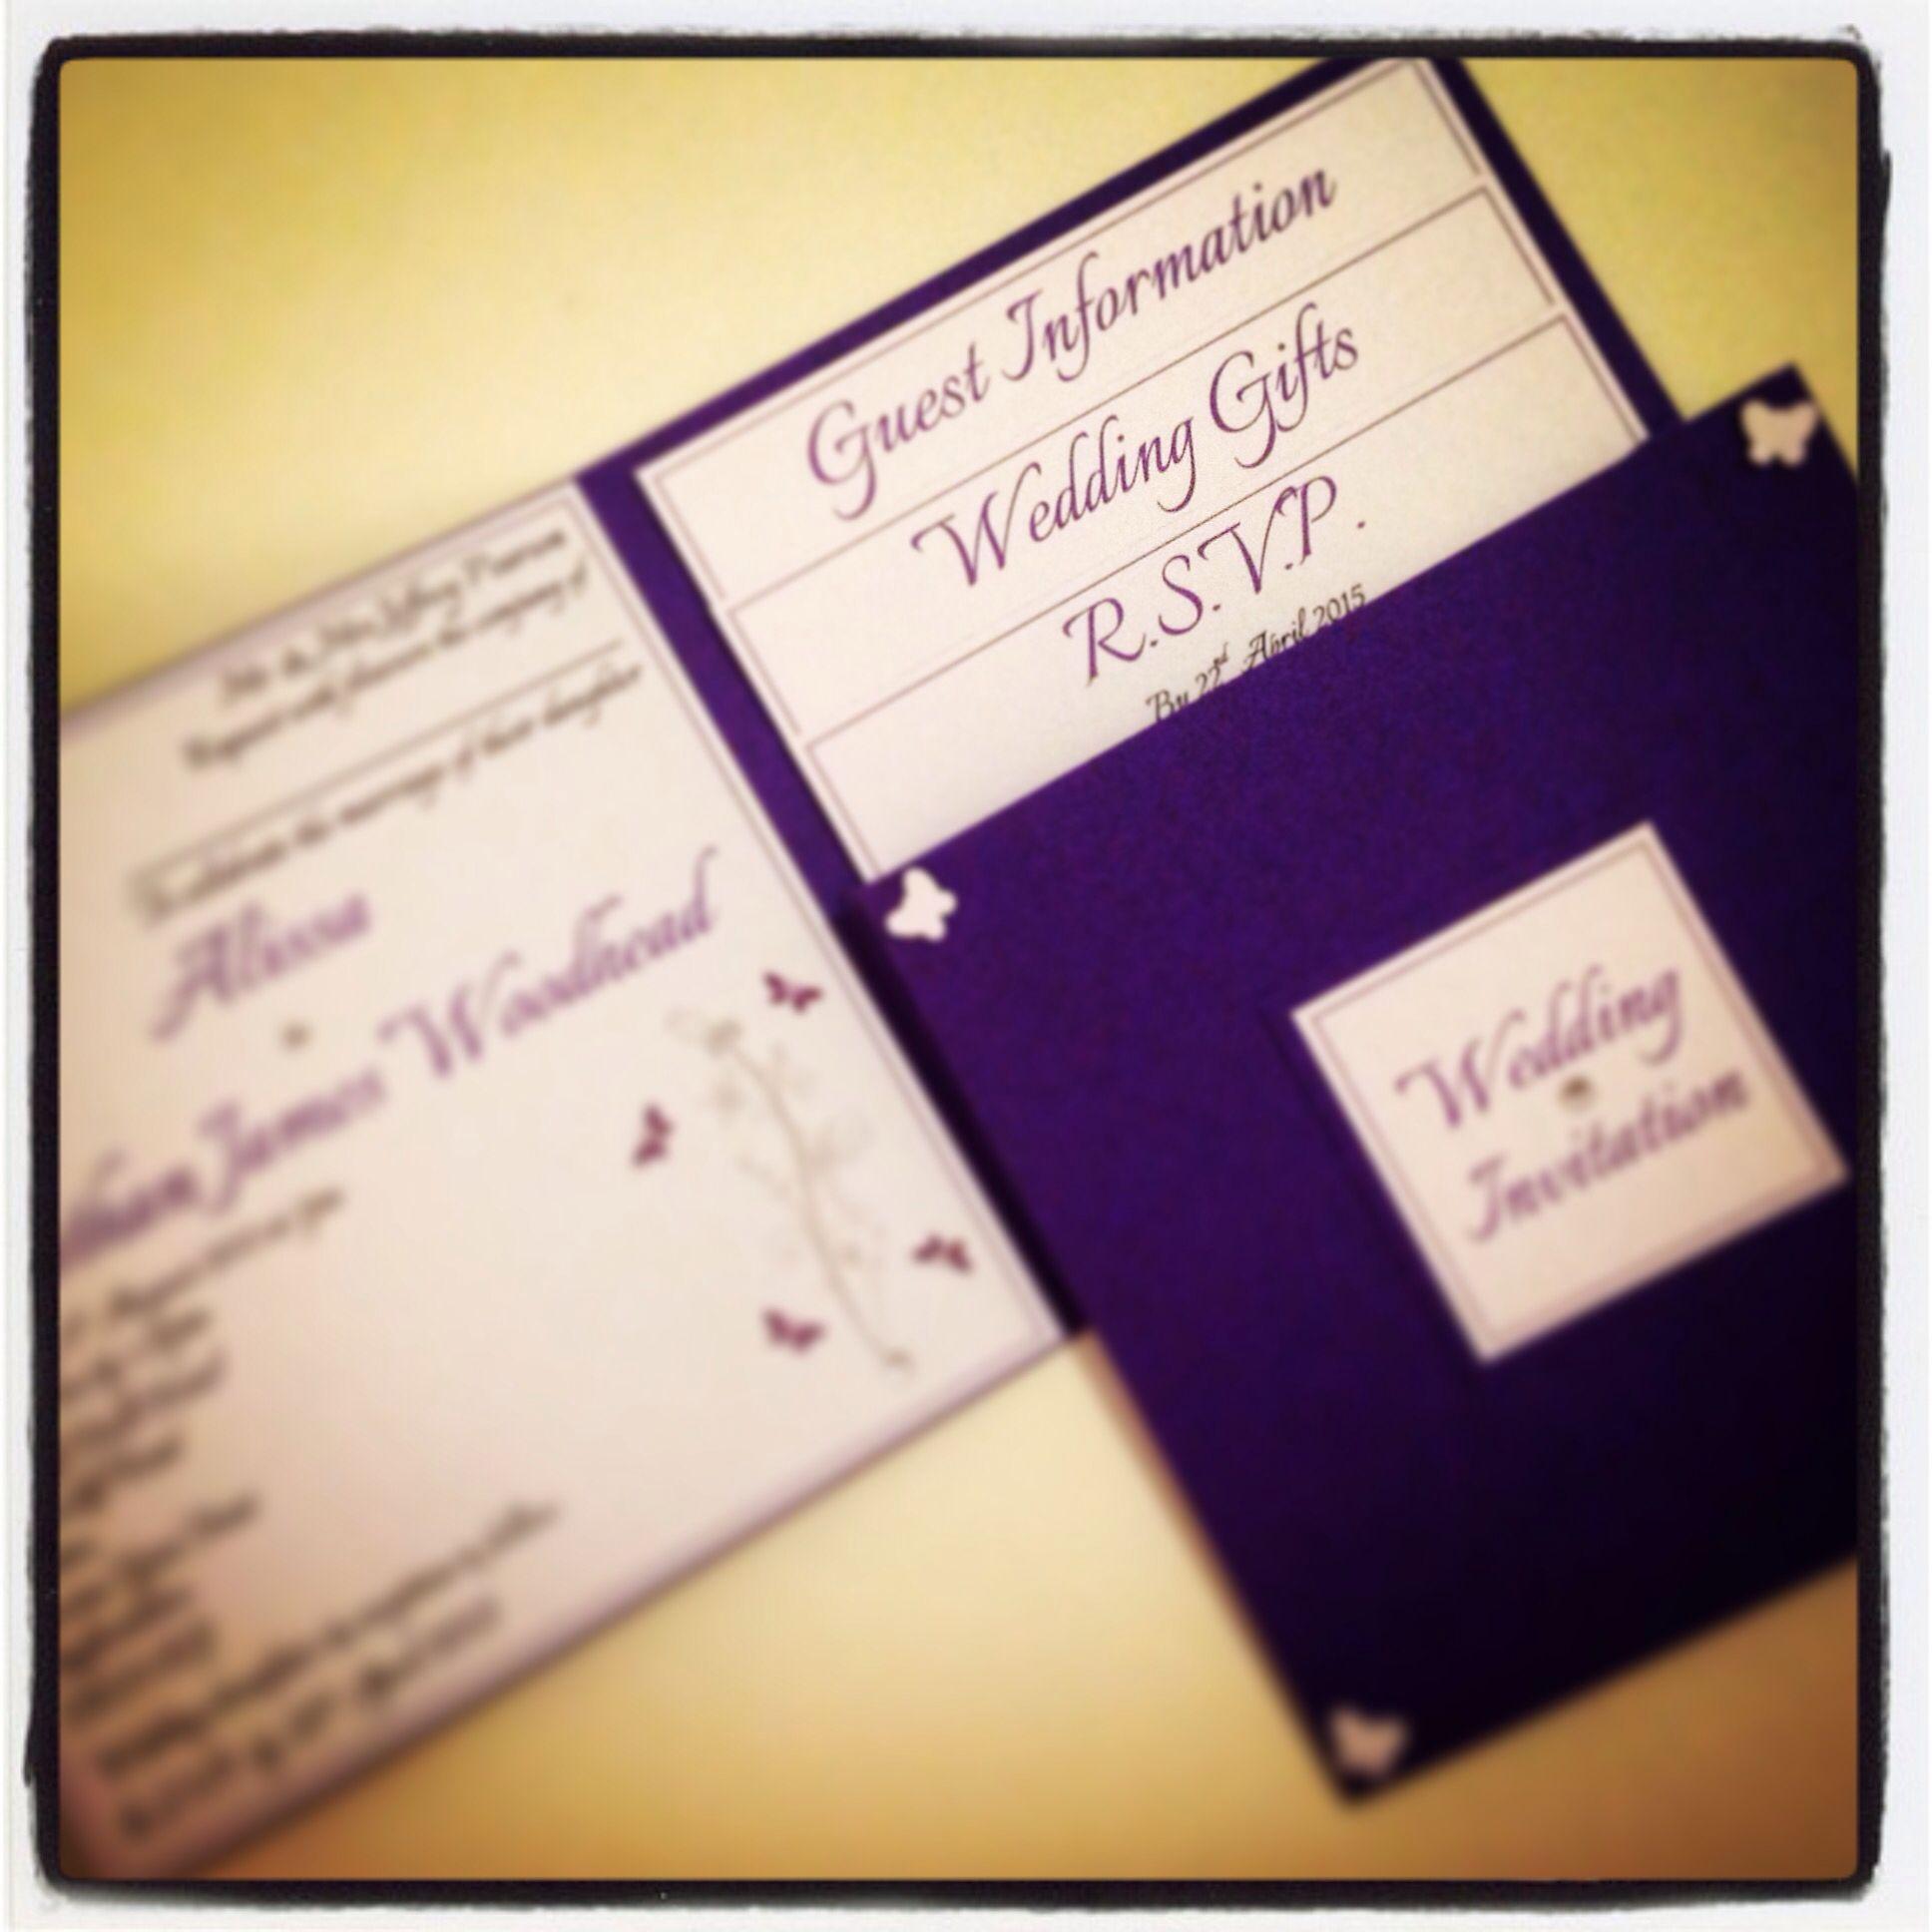 Cadbury purple wedding invitations | Weddings By Winslow | Pinterest ...